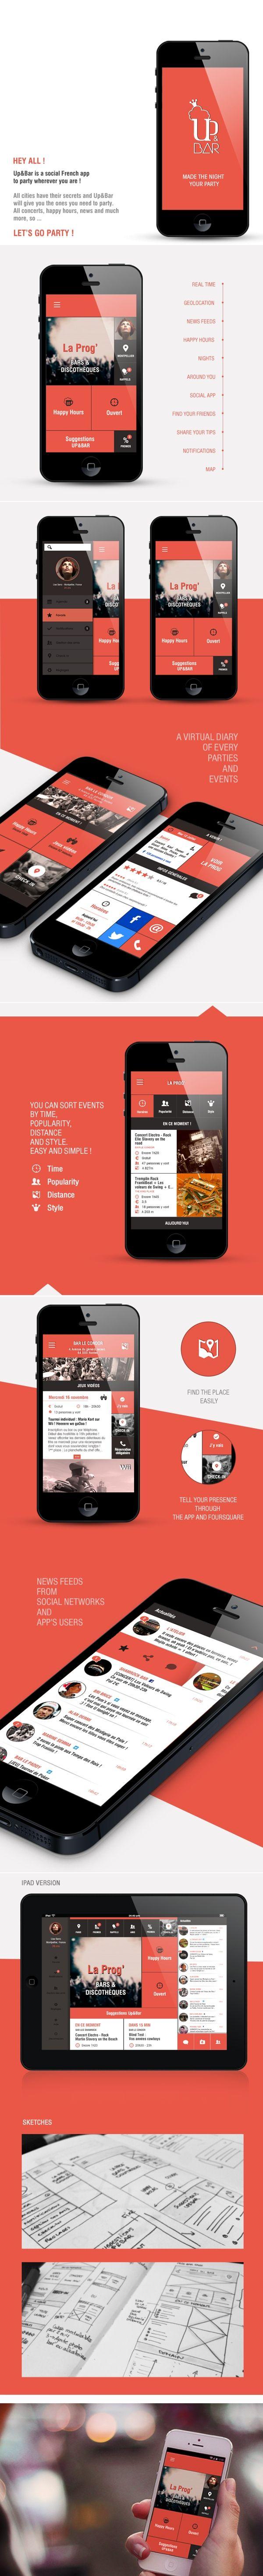 pinterest.com/fra411 #UI - Up-Bar-App-Project